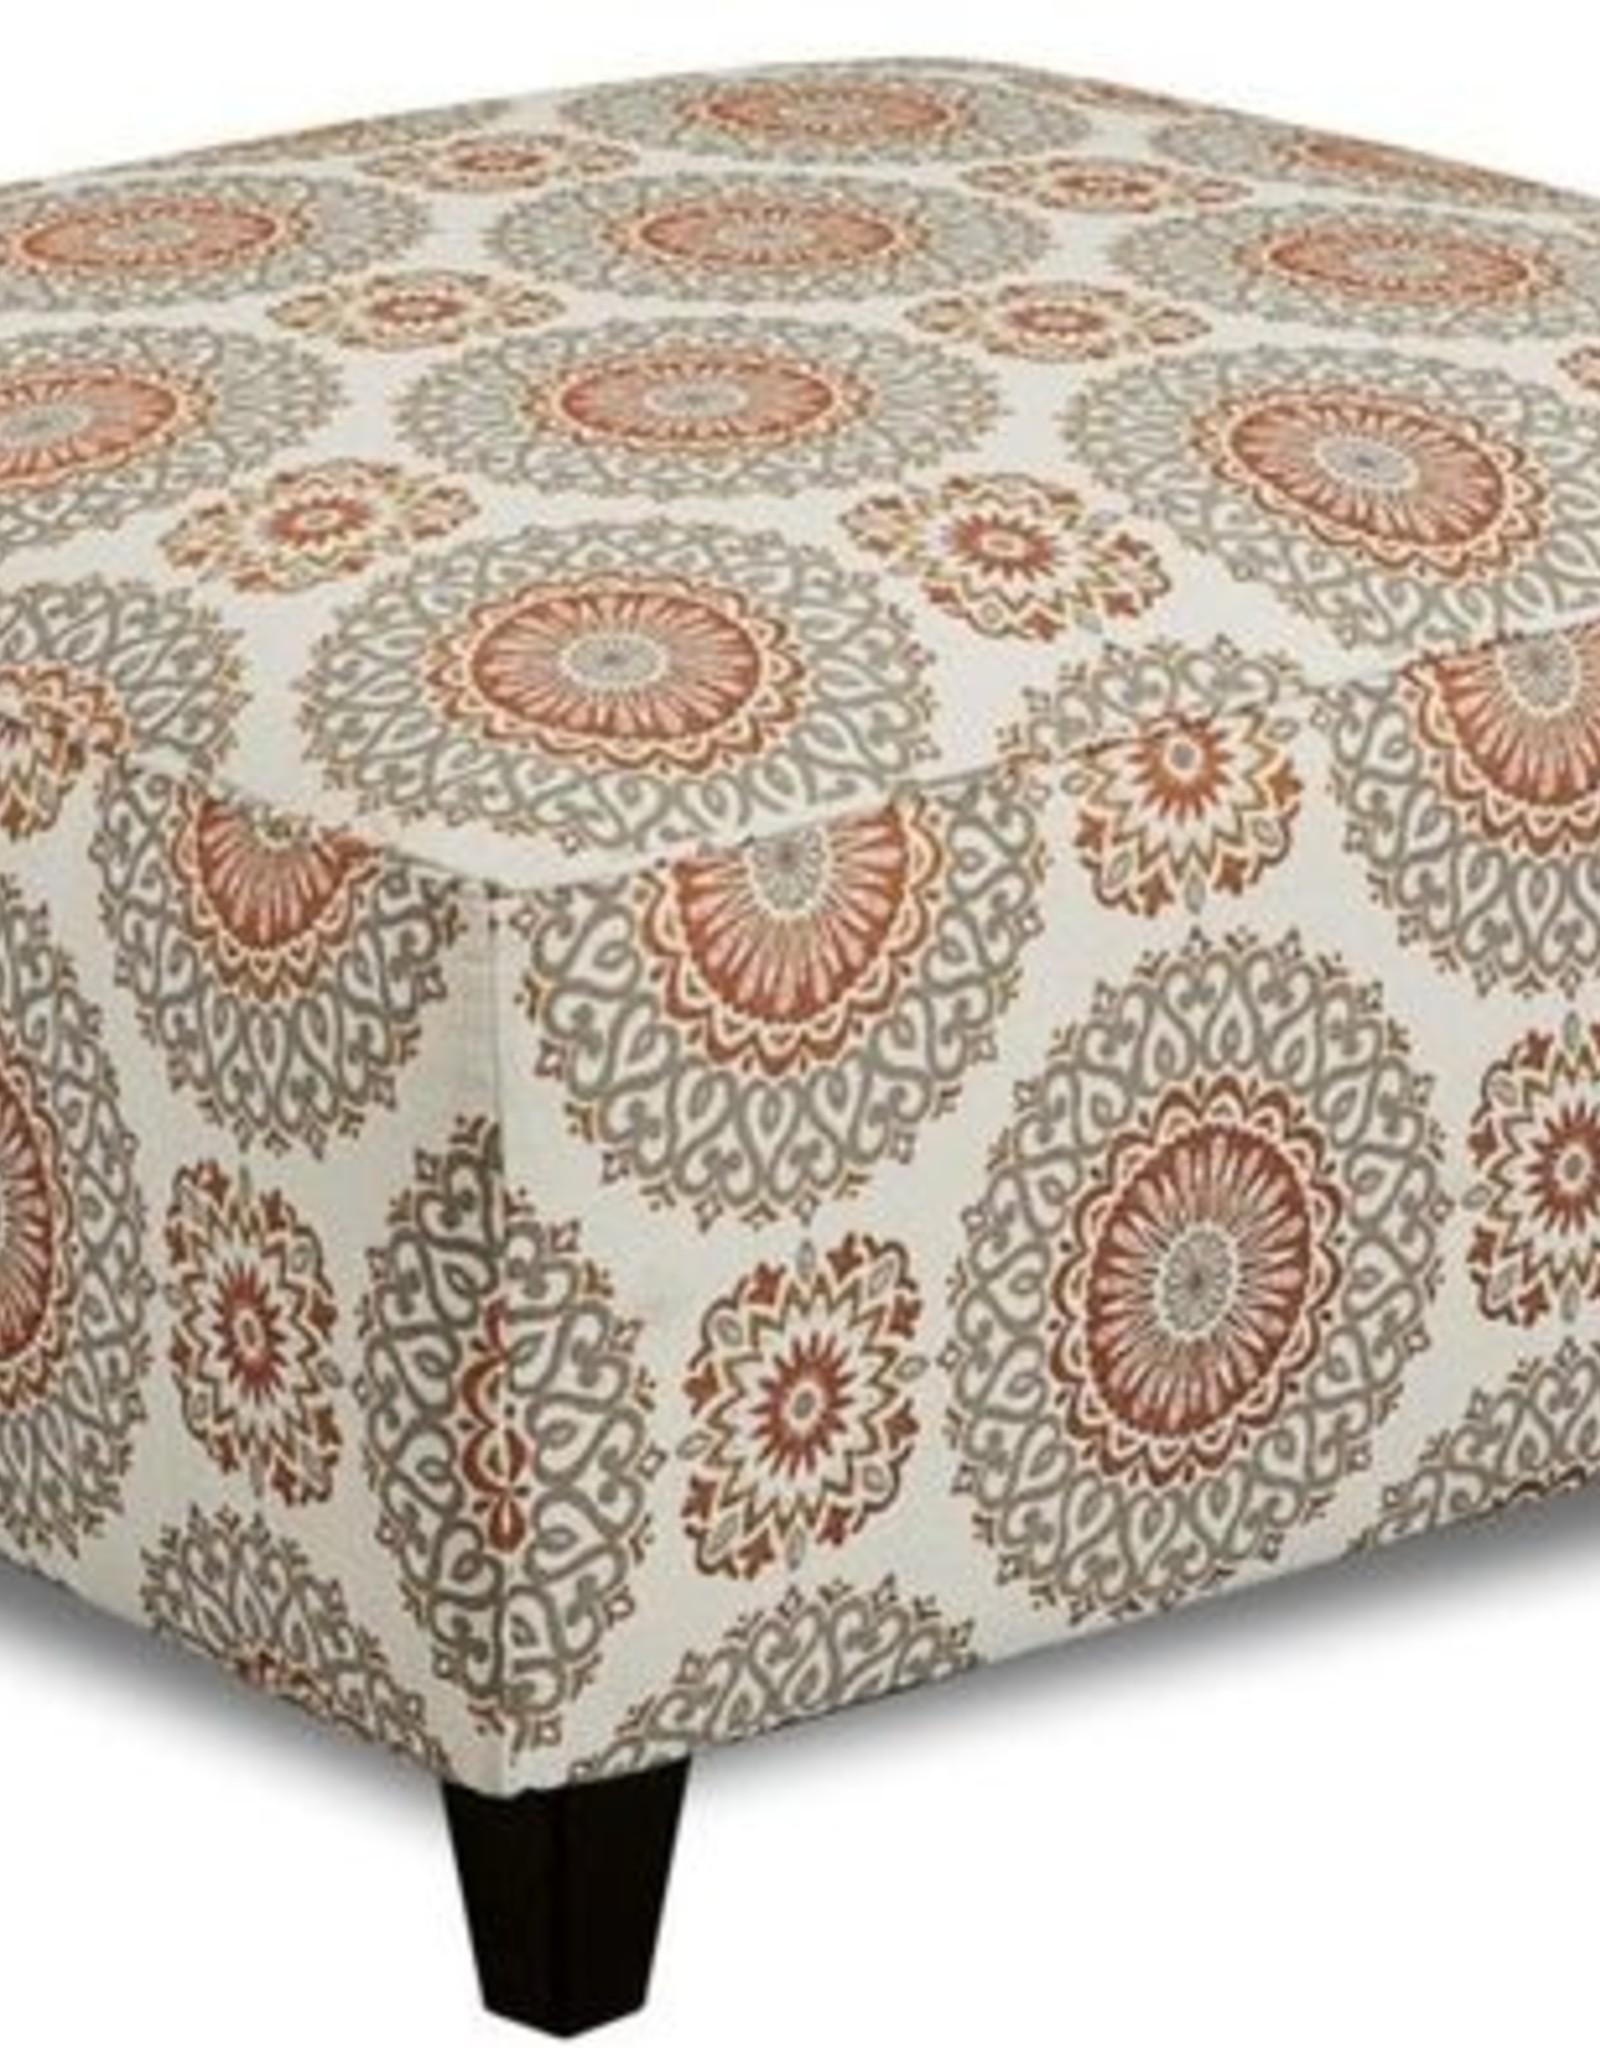 Affordable Furniture Brianne Marmmalade Ottoman